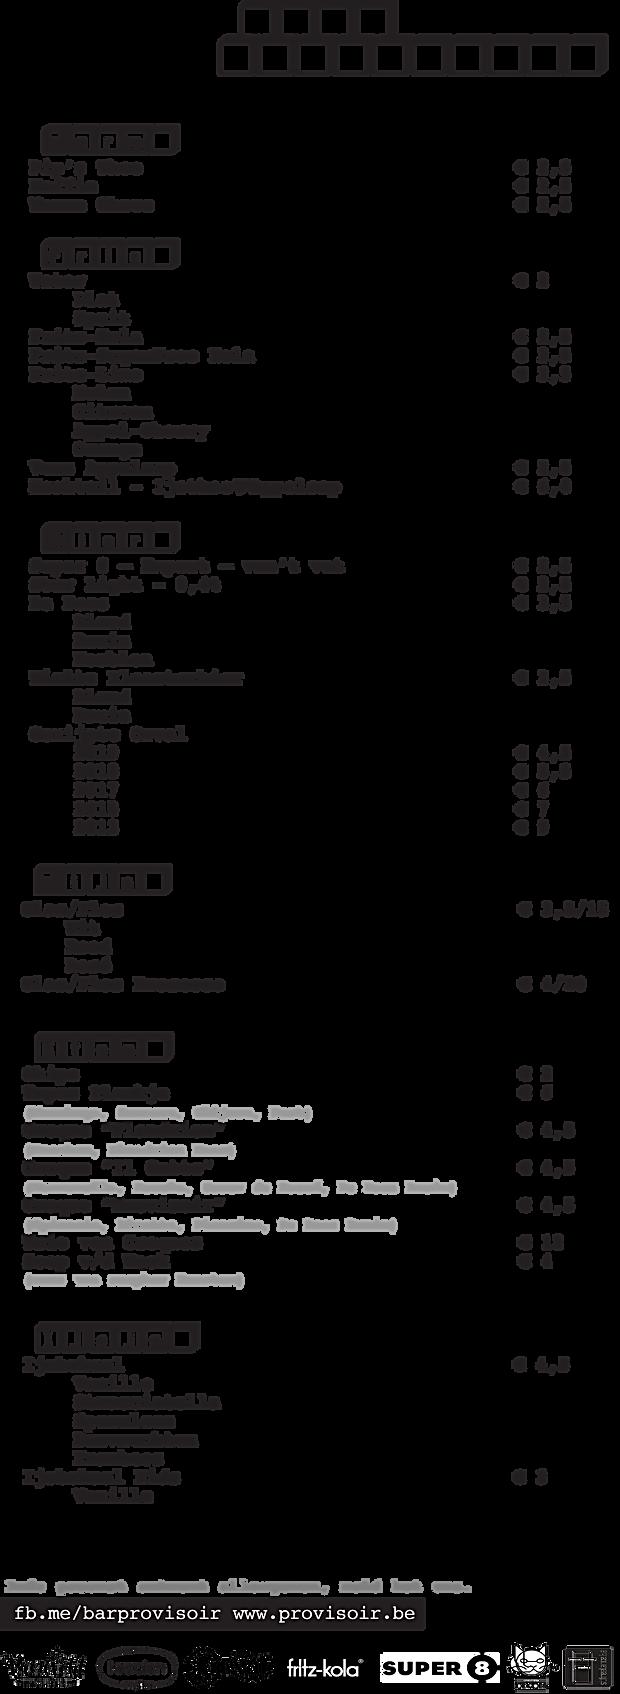 QR prijslijst 202009.png